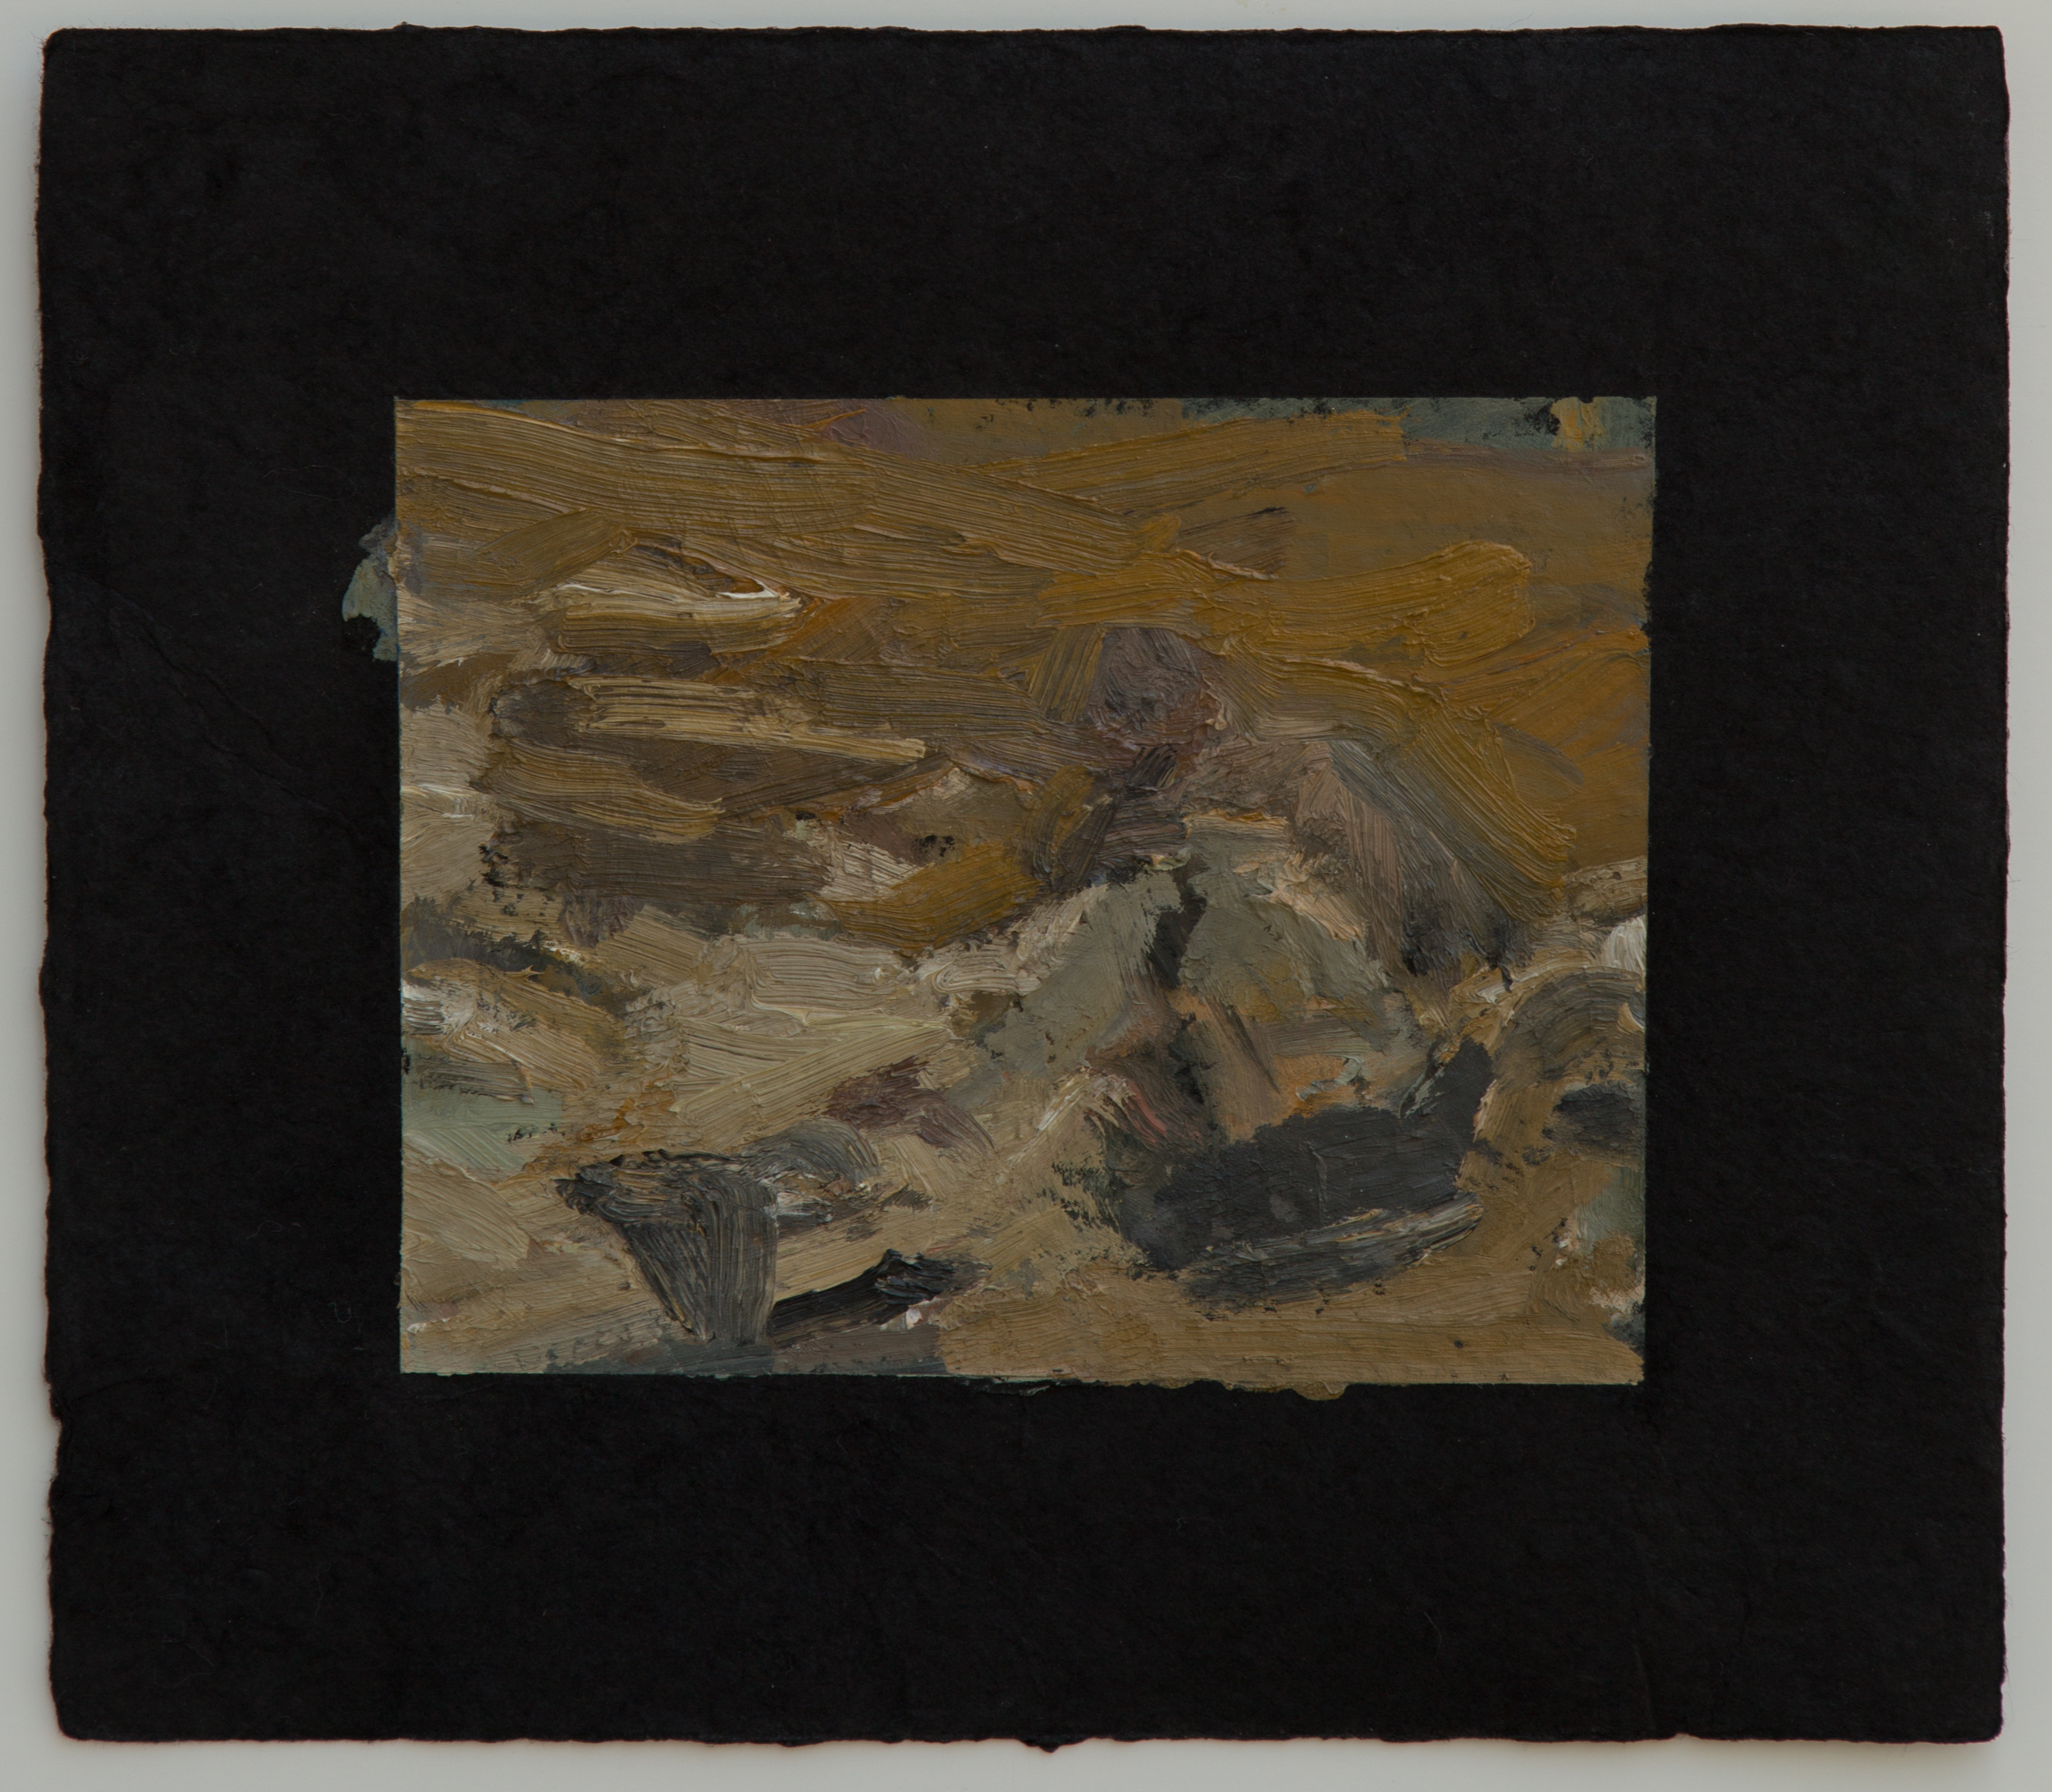 "Campfire study VII, 9 x 10"", 2016"